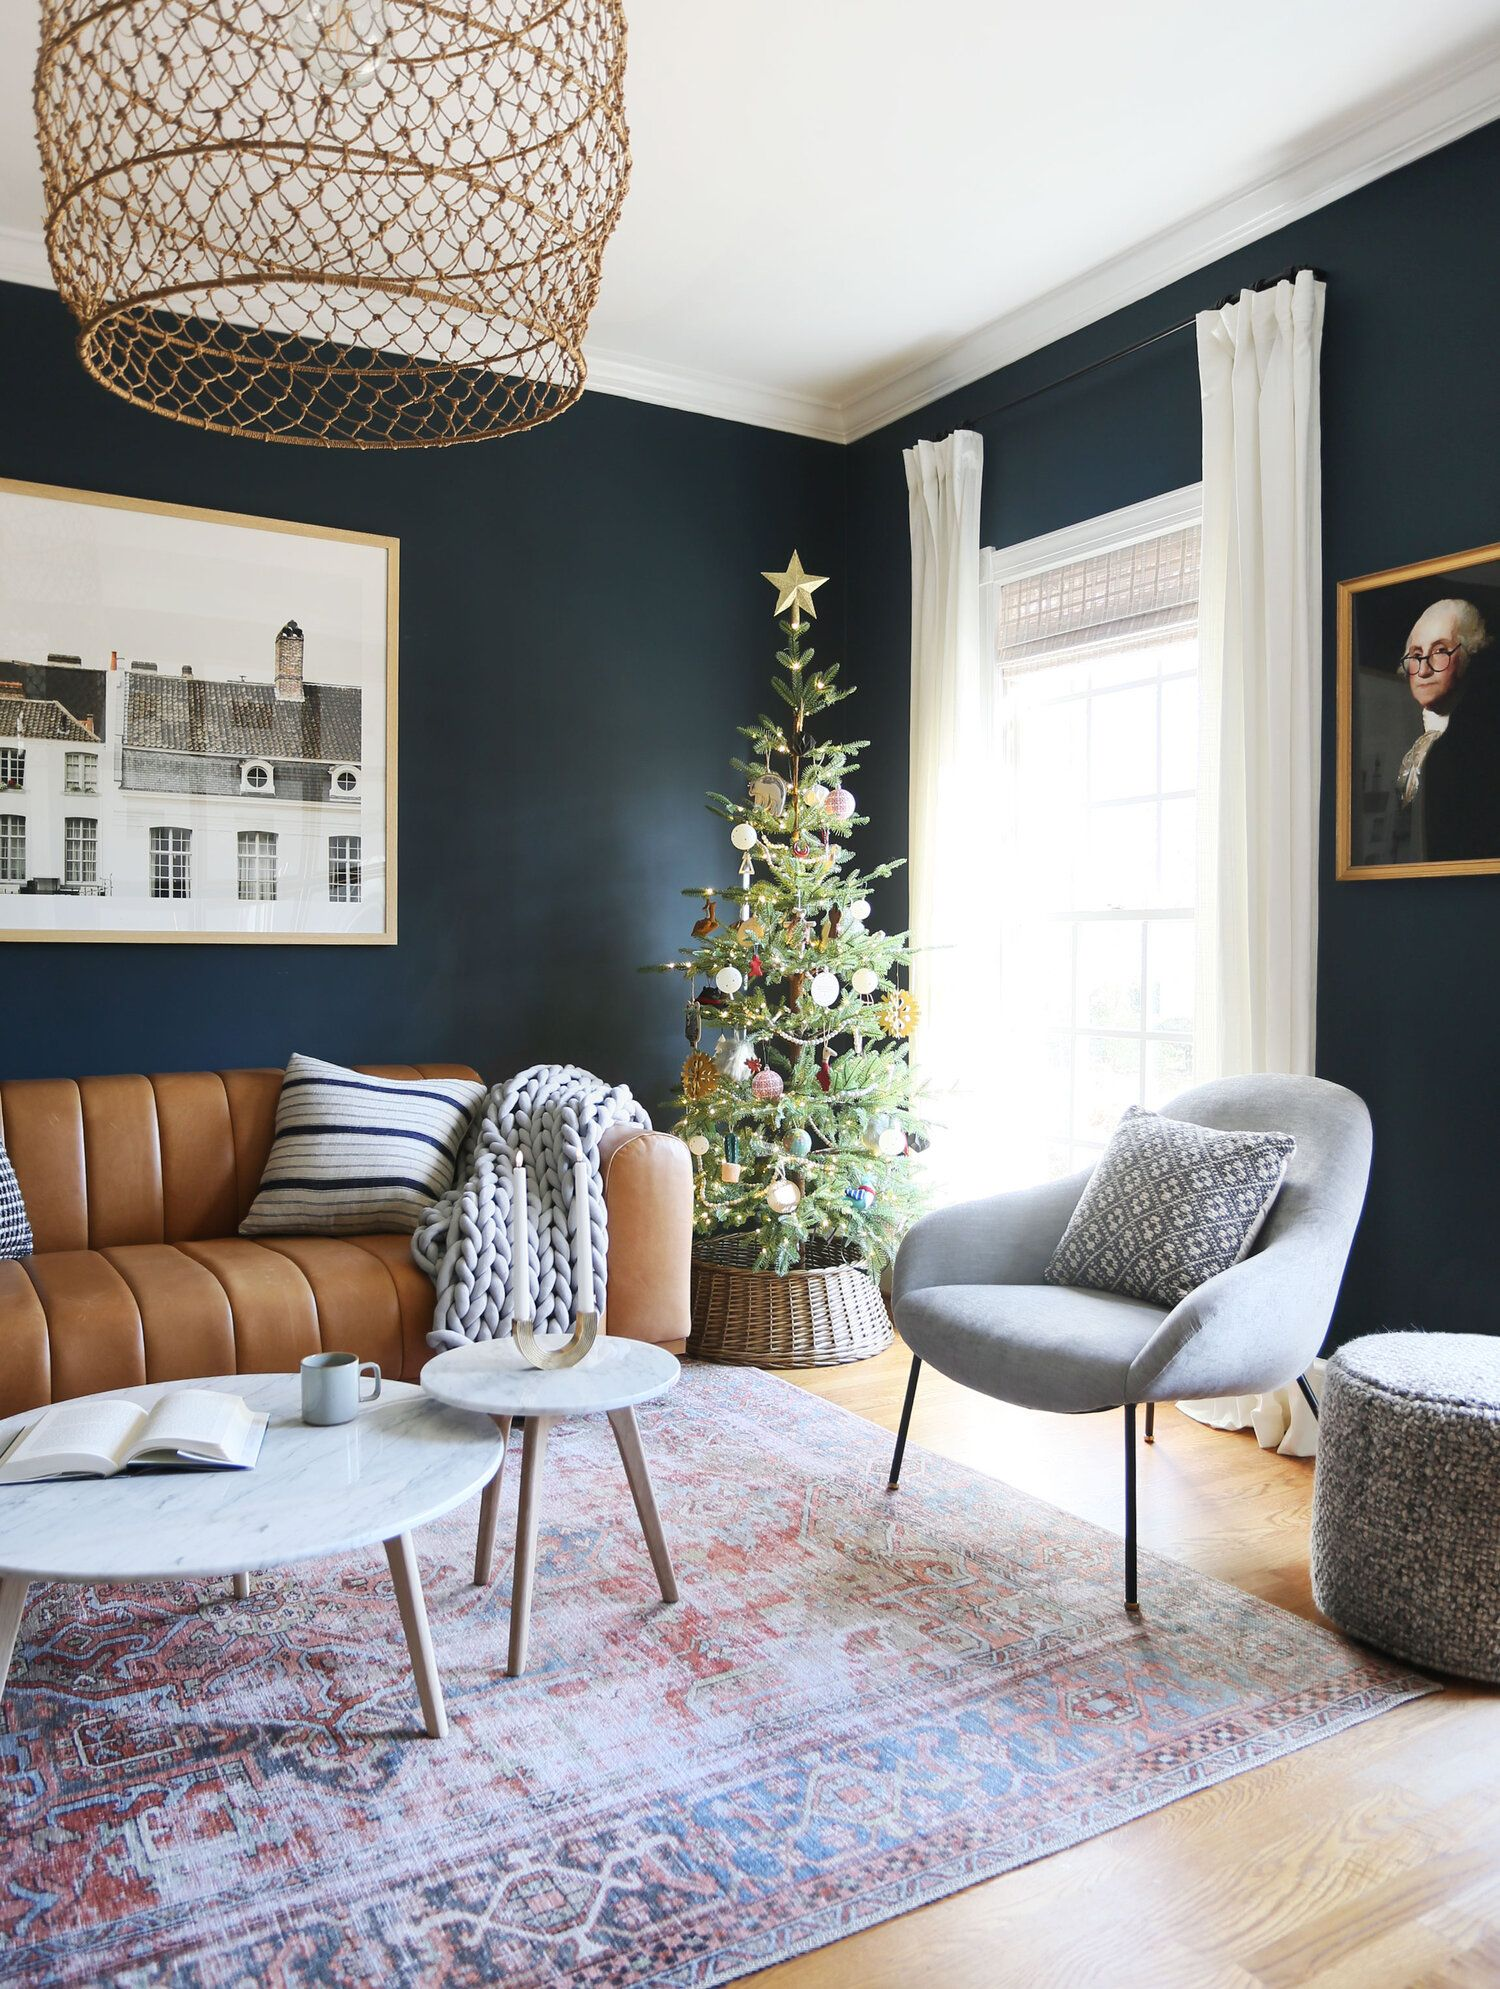 My Moody Festive Loffice Lounge Office In 2020 Moody Living Room Living Room Inspiration Dark Walls Living Room #office #space #living #room